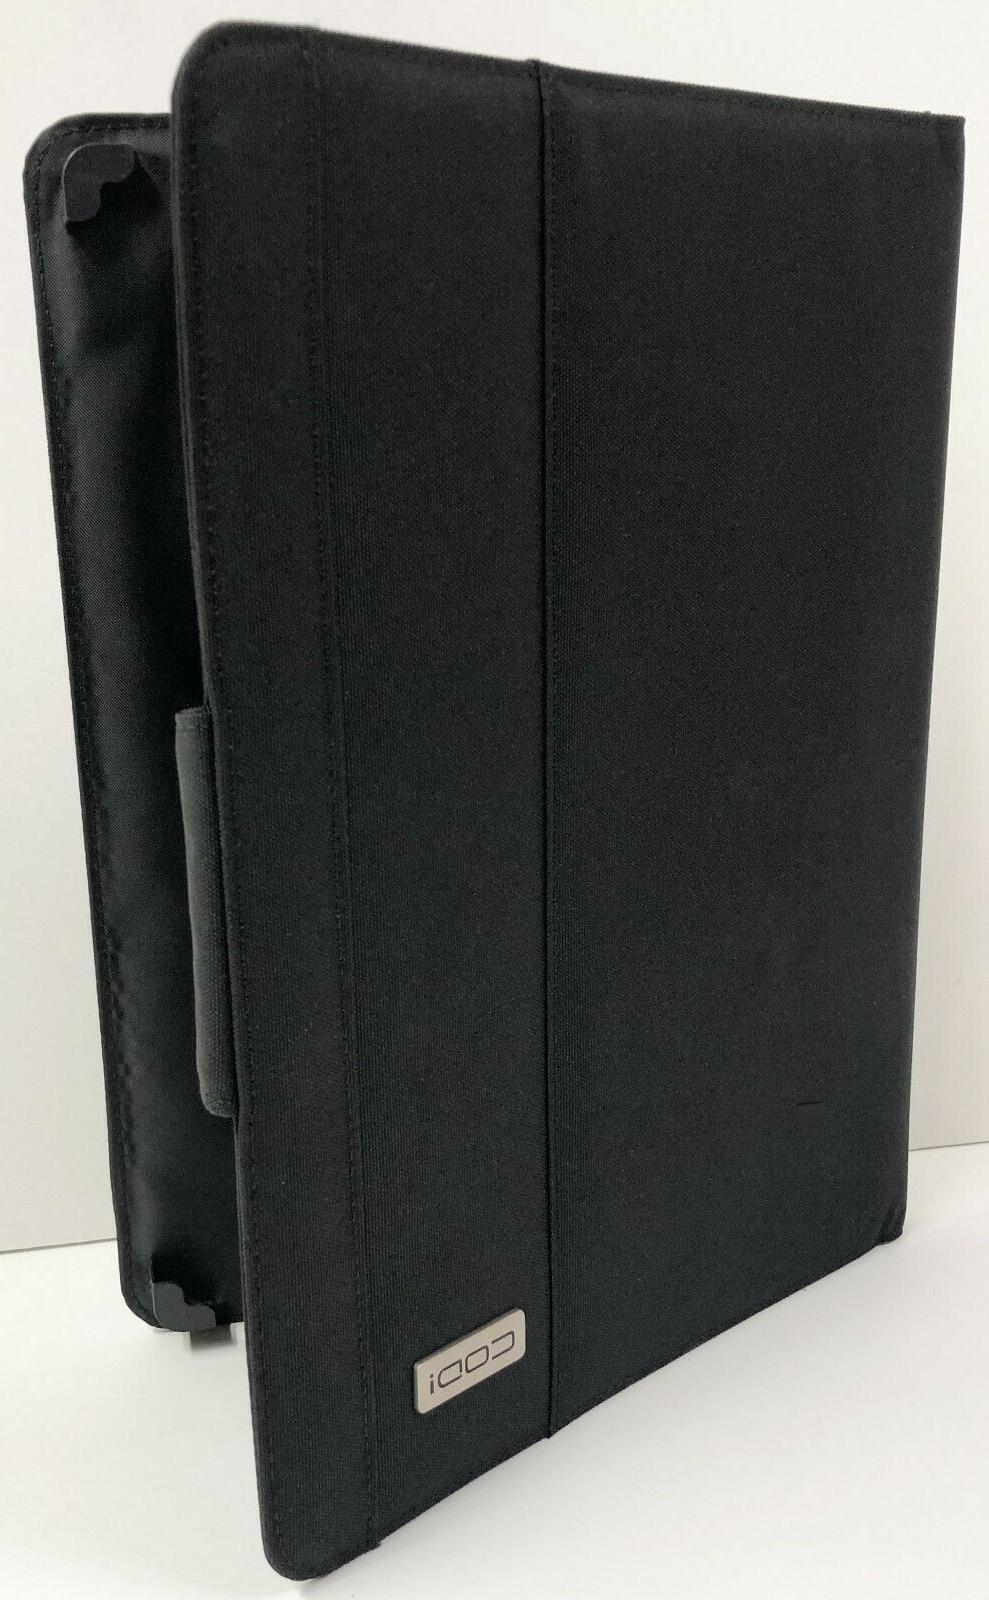 Codi Chromebook 11 - NEW